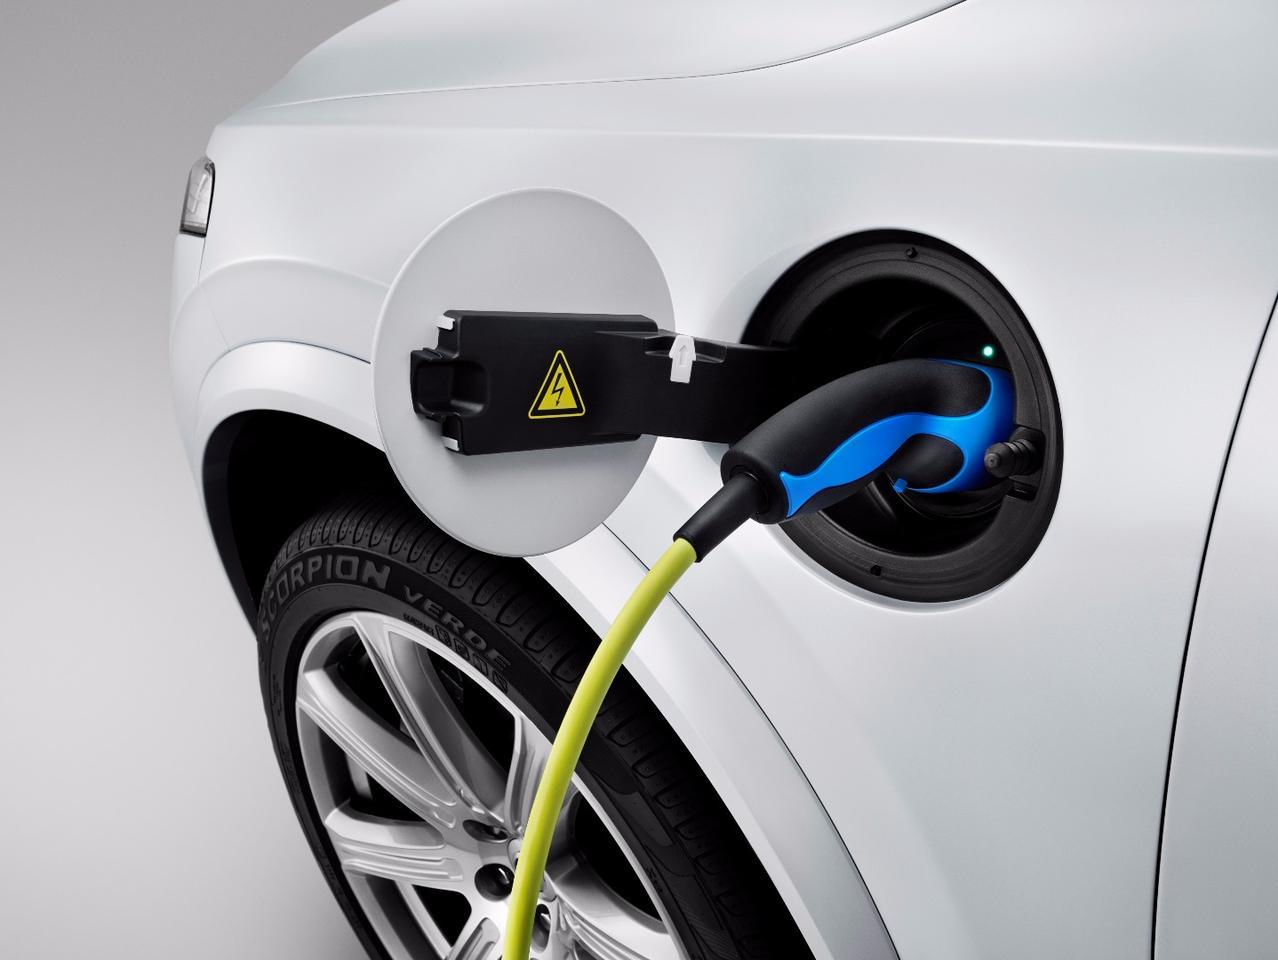 The XC90 SUV with plug-in hybrid powertrain